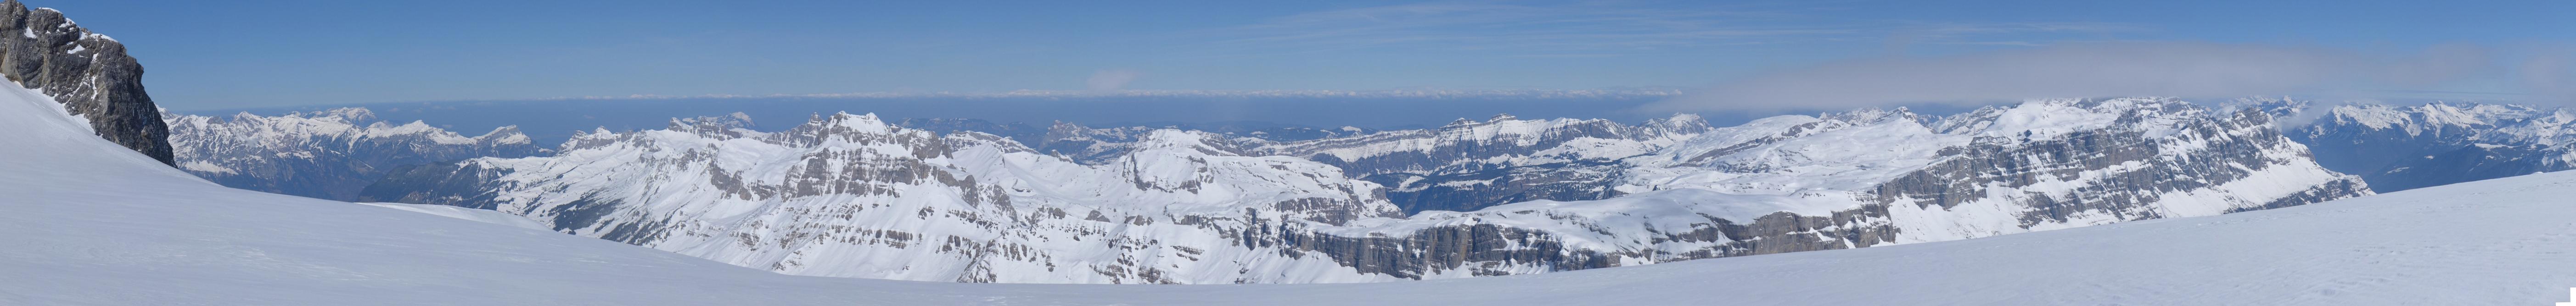 Planurahütte Glarner Alpen Schweiz panorama 47